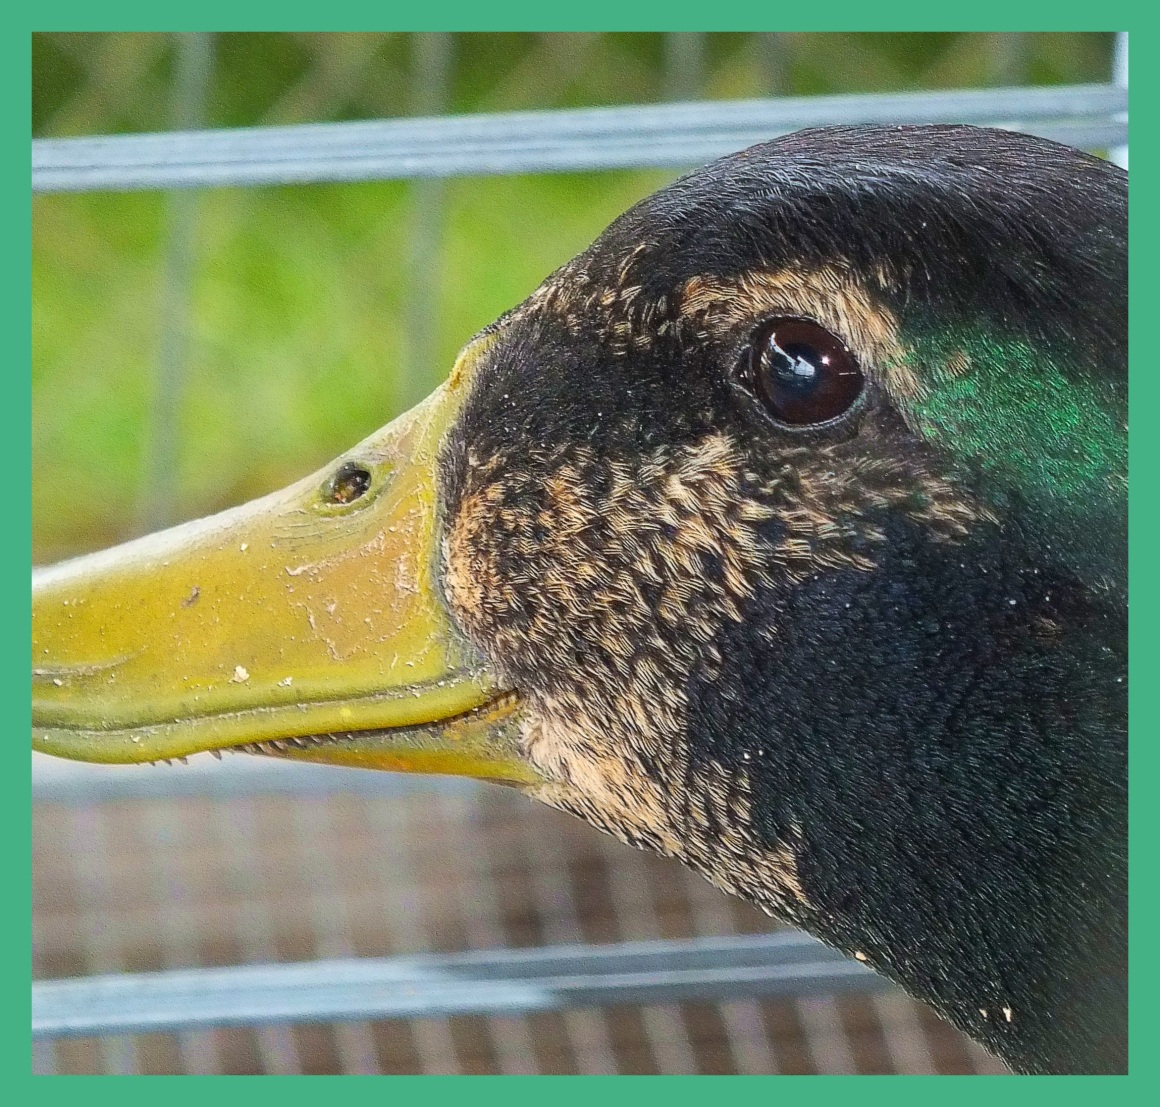 Duck Teeth. Photo by Thomas Peace c. 2015